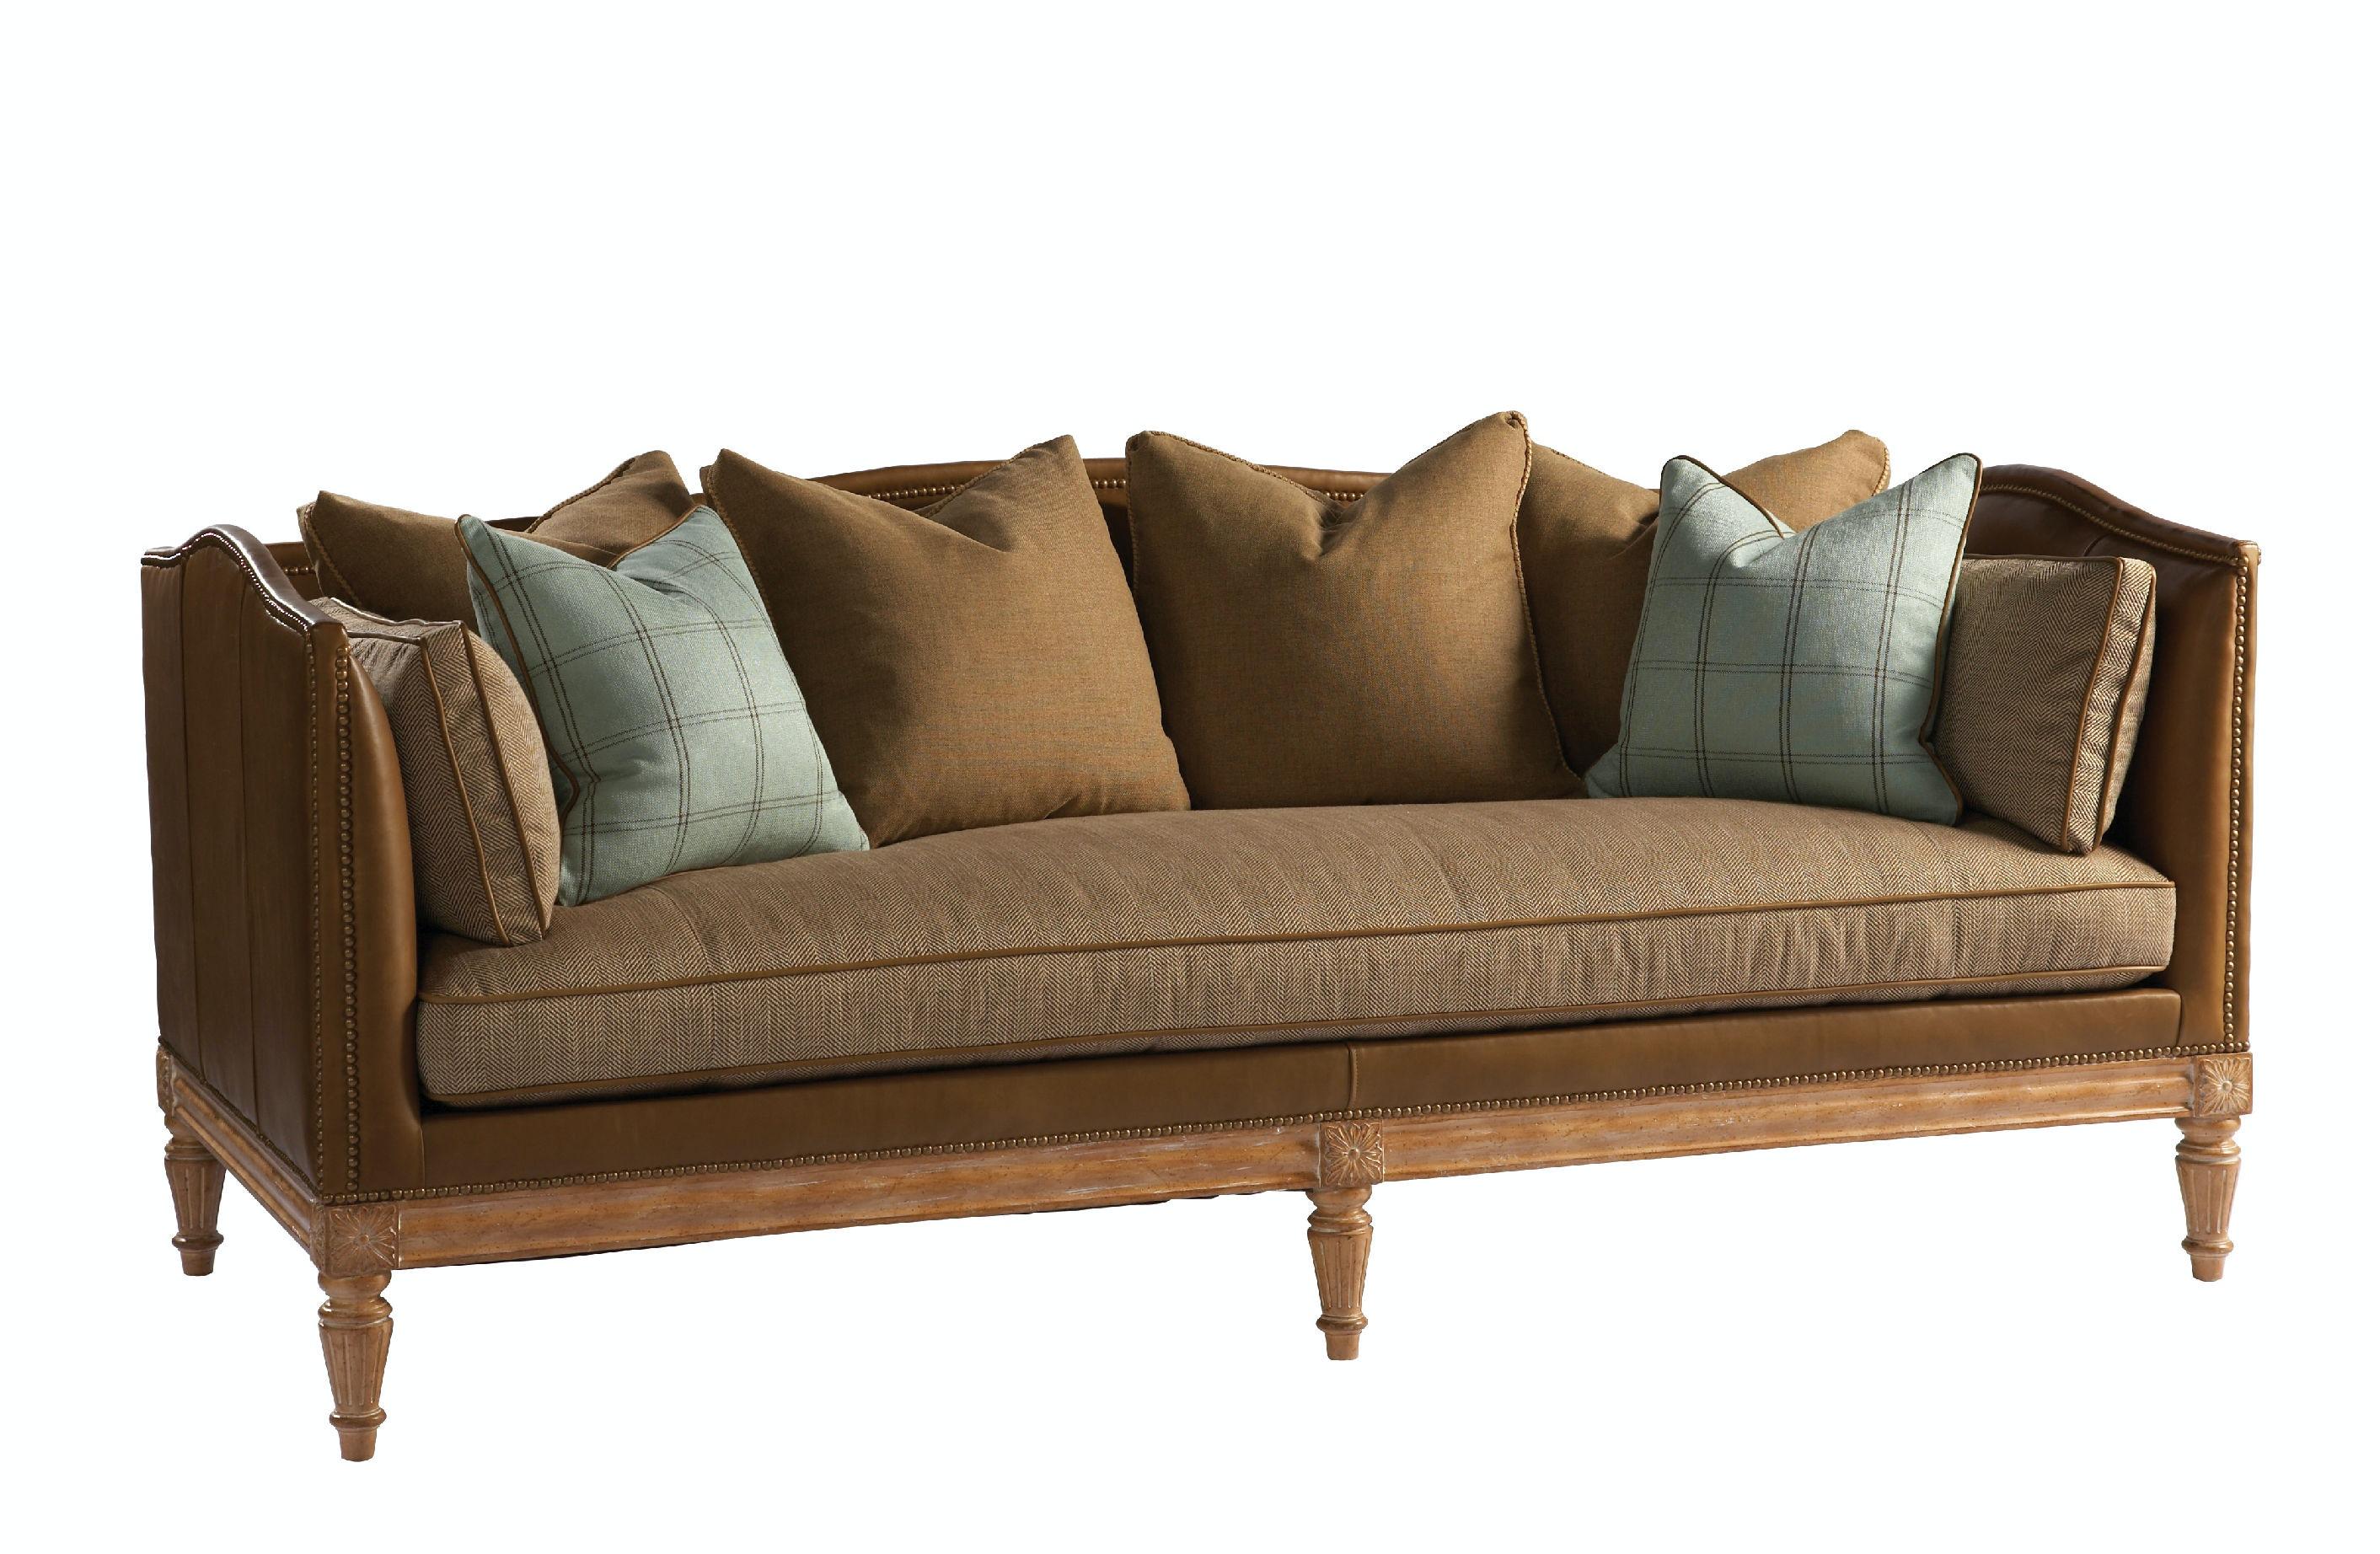 Lillian August For Hickory White Belvedere Sofa LNALL2034S From Walter E.  Smithe Furniture + Design